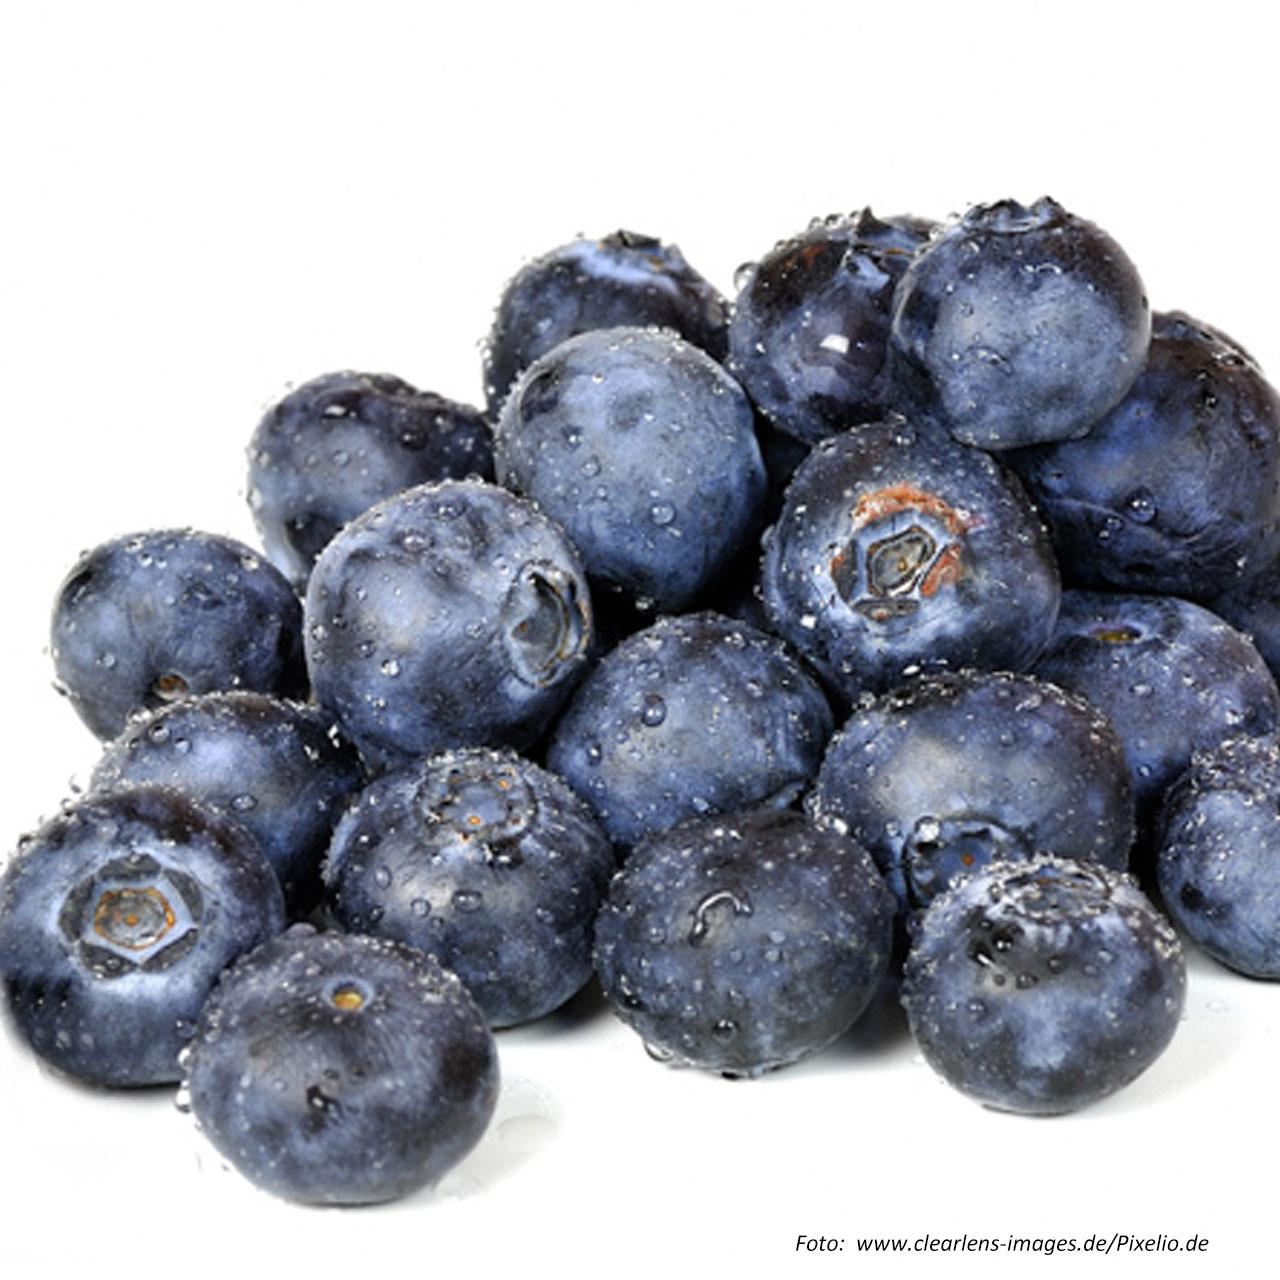 Lexikon: Dunkelrotes, violettes & blaues Obst & Gemüse » Kochrezepte ...